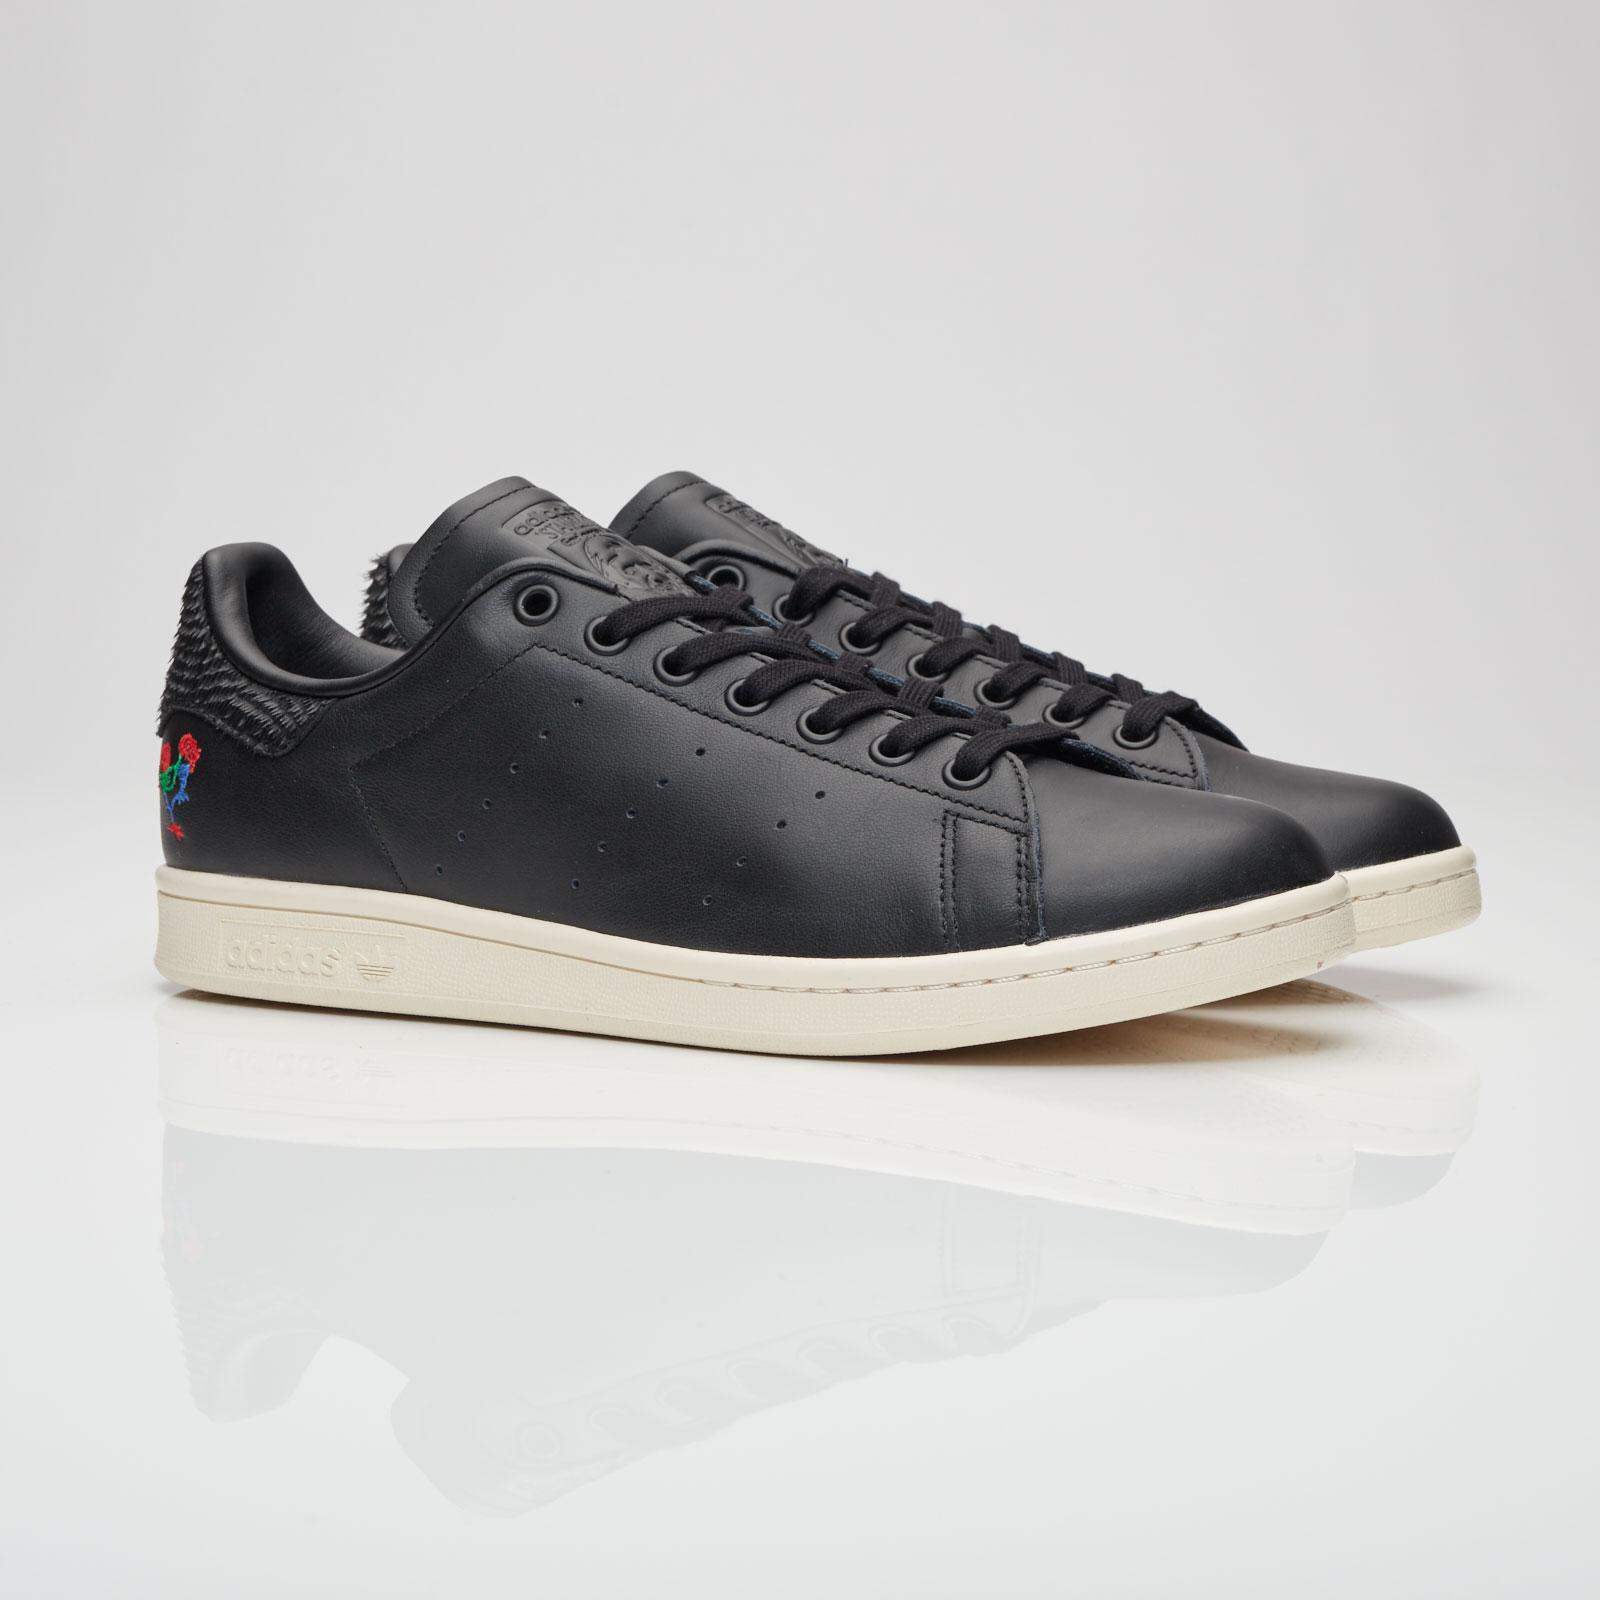 adidas superstar 5 g mémoire termes diapositives onglet velcro diapositives onglet noir